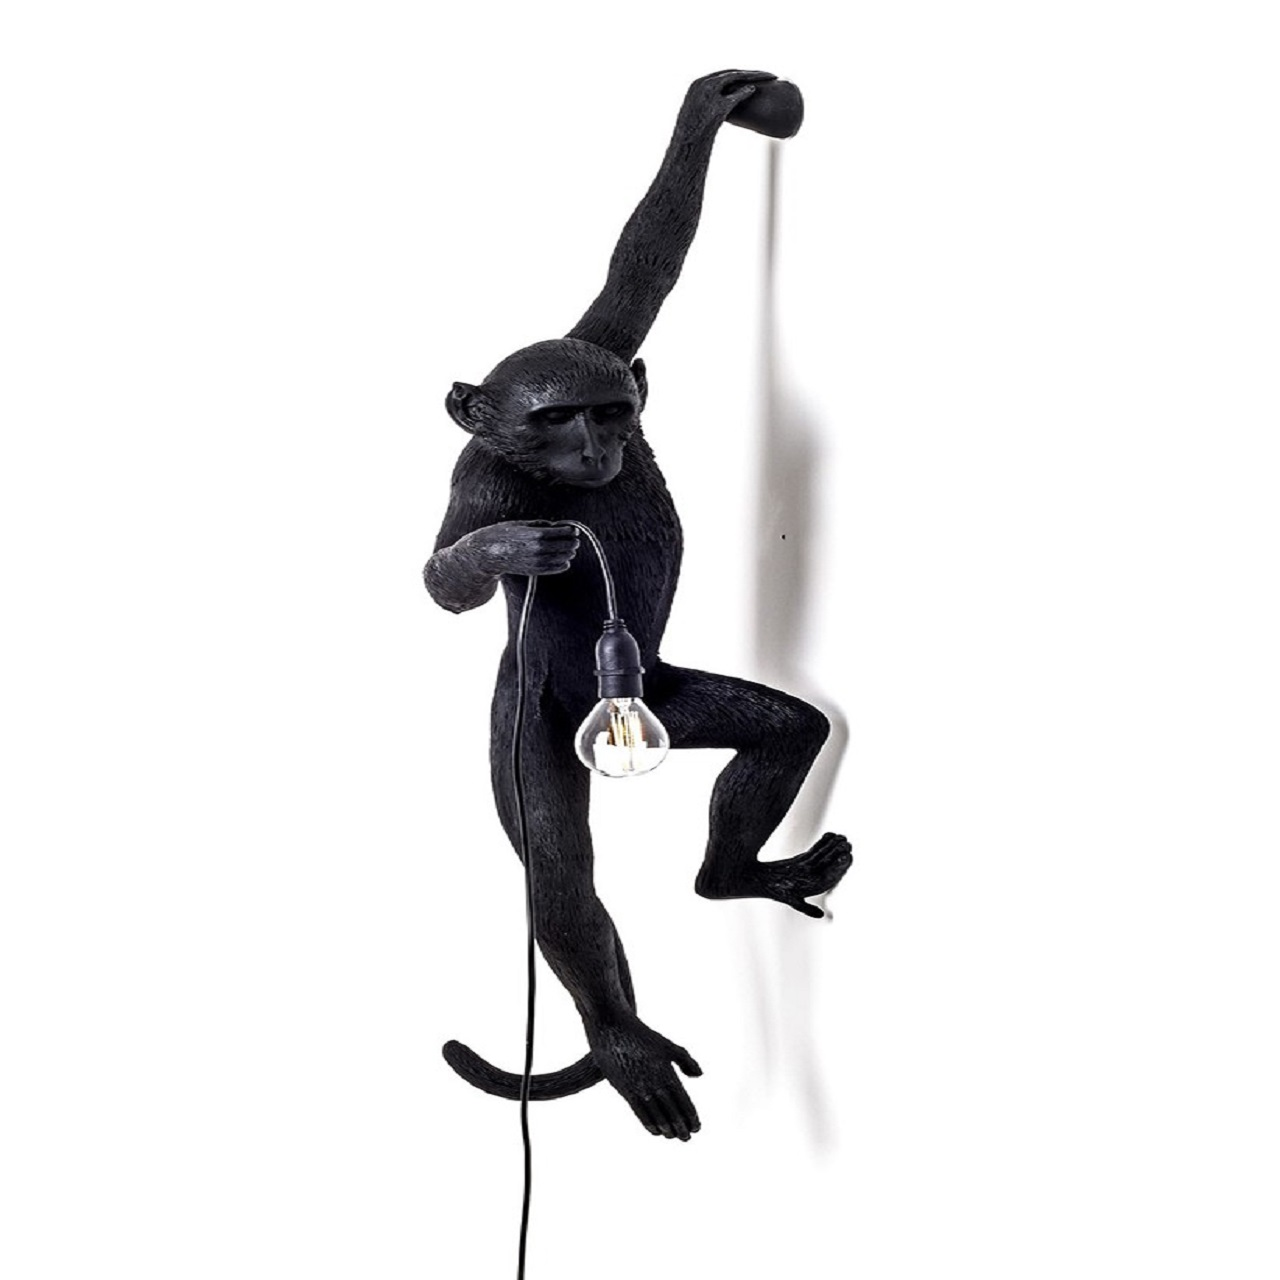 Monkey Lamp pendurado esquerda   Preto